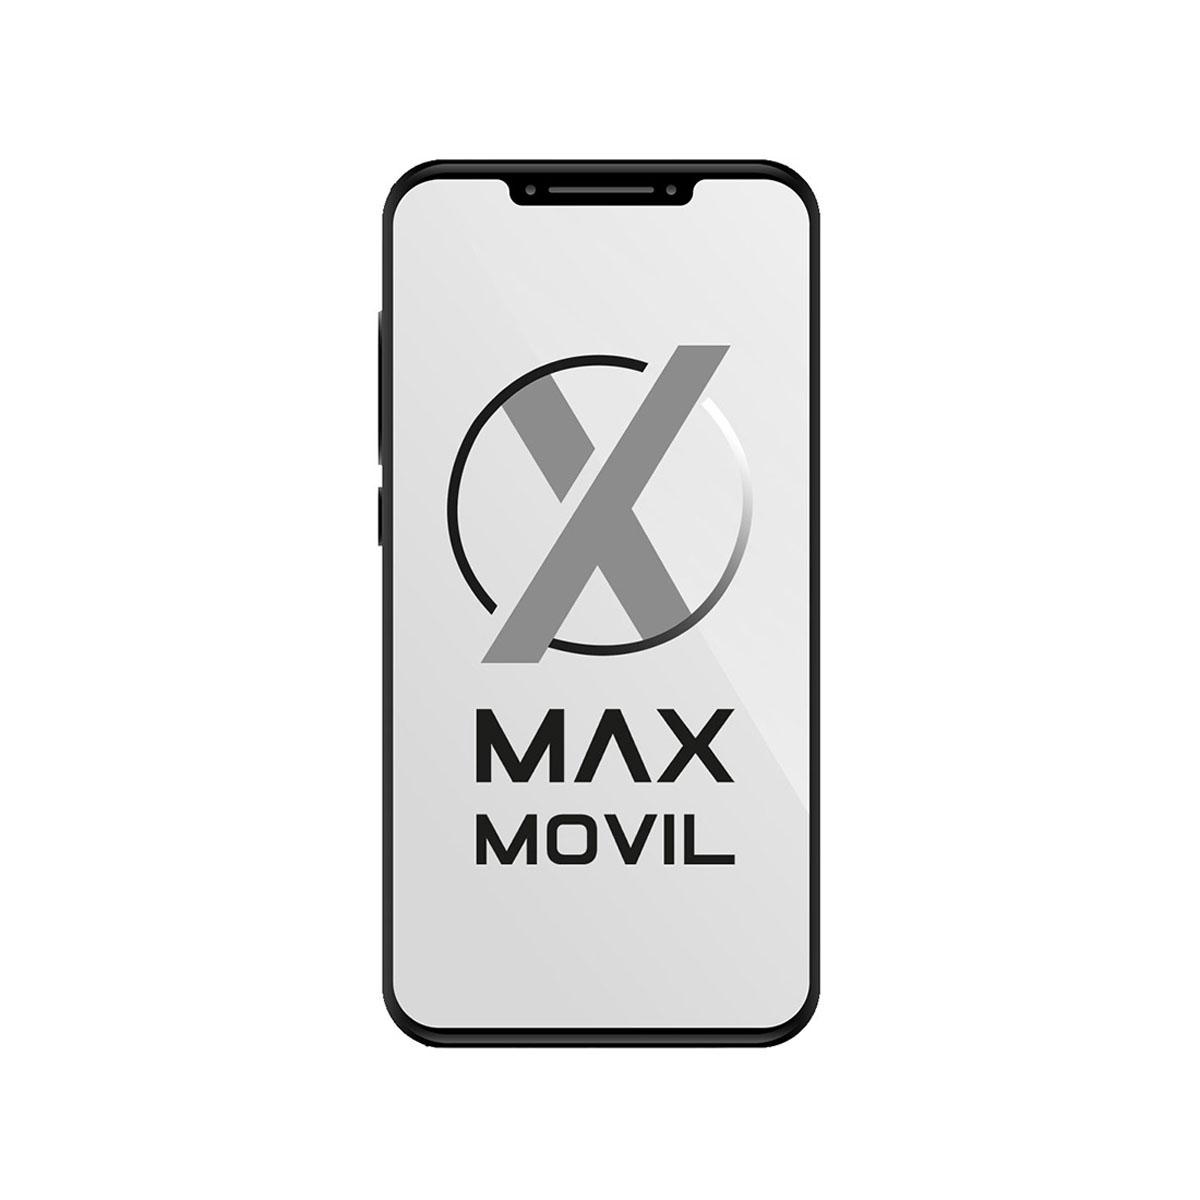 Samsung Galaxy S7 G930F Plata 32Gb libre en maxmovil